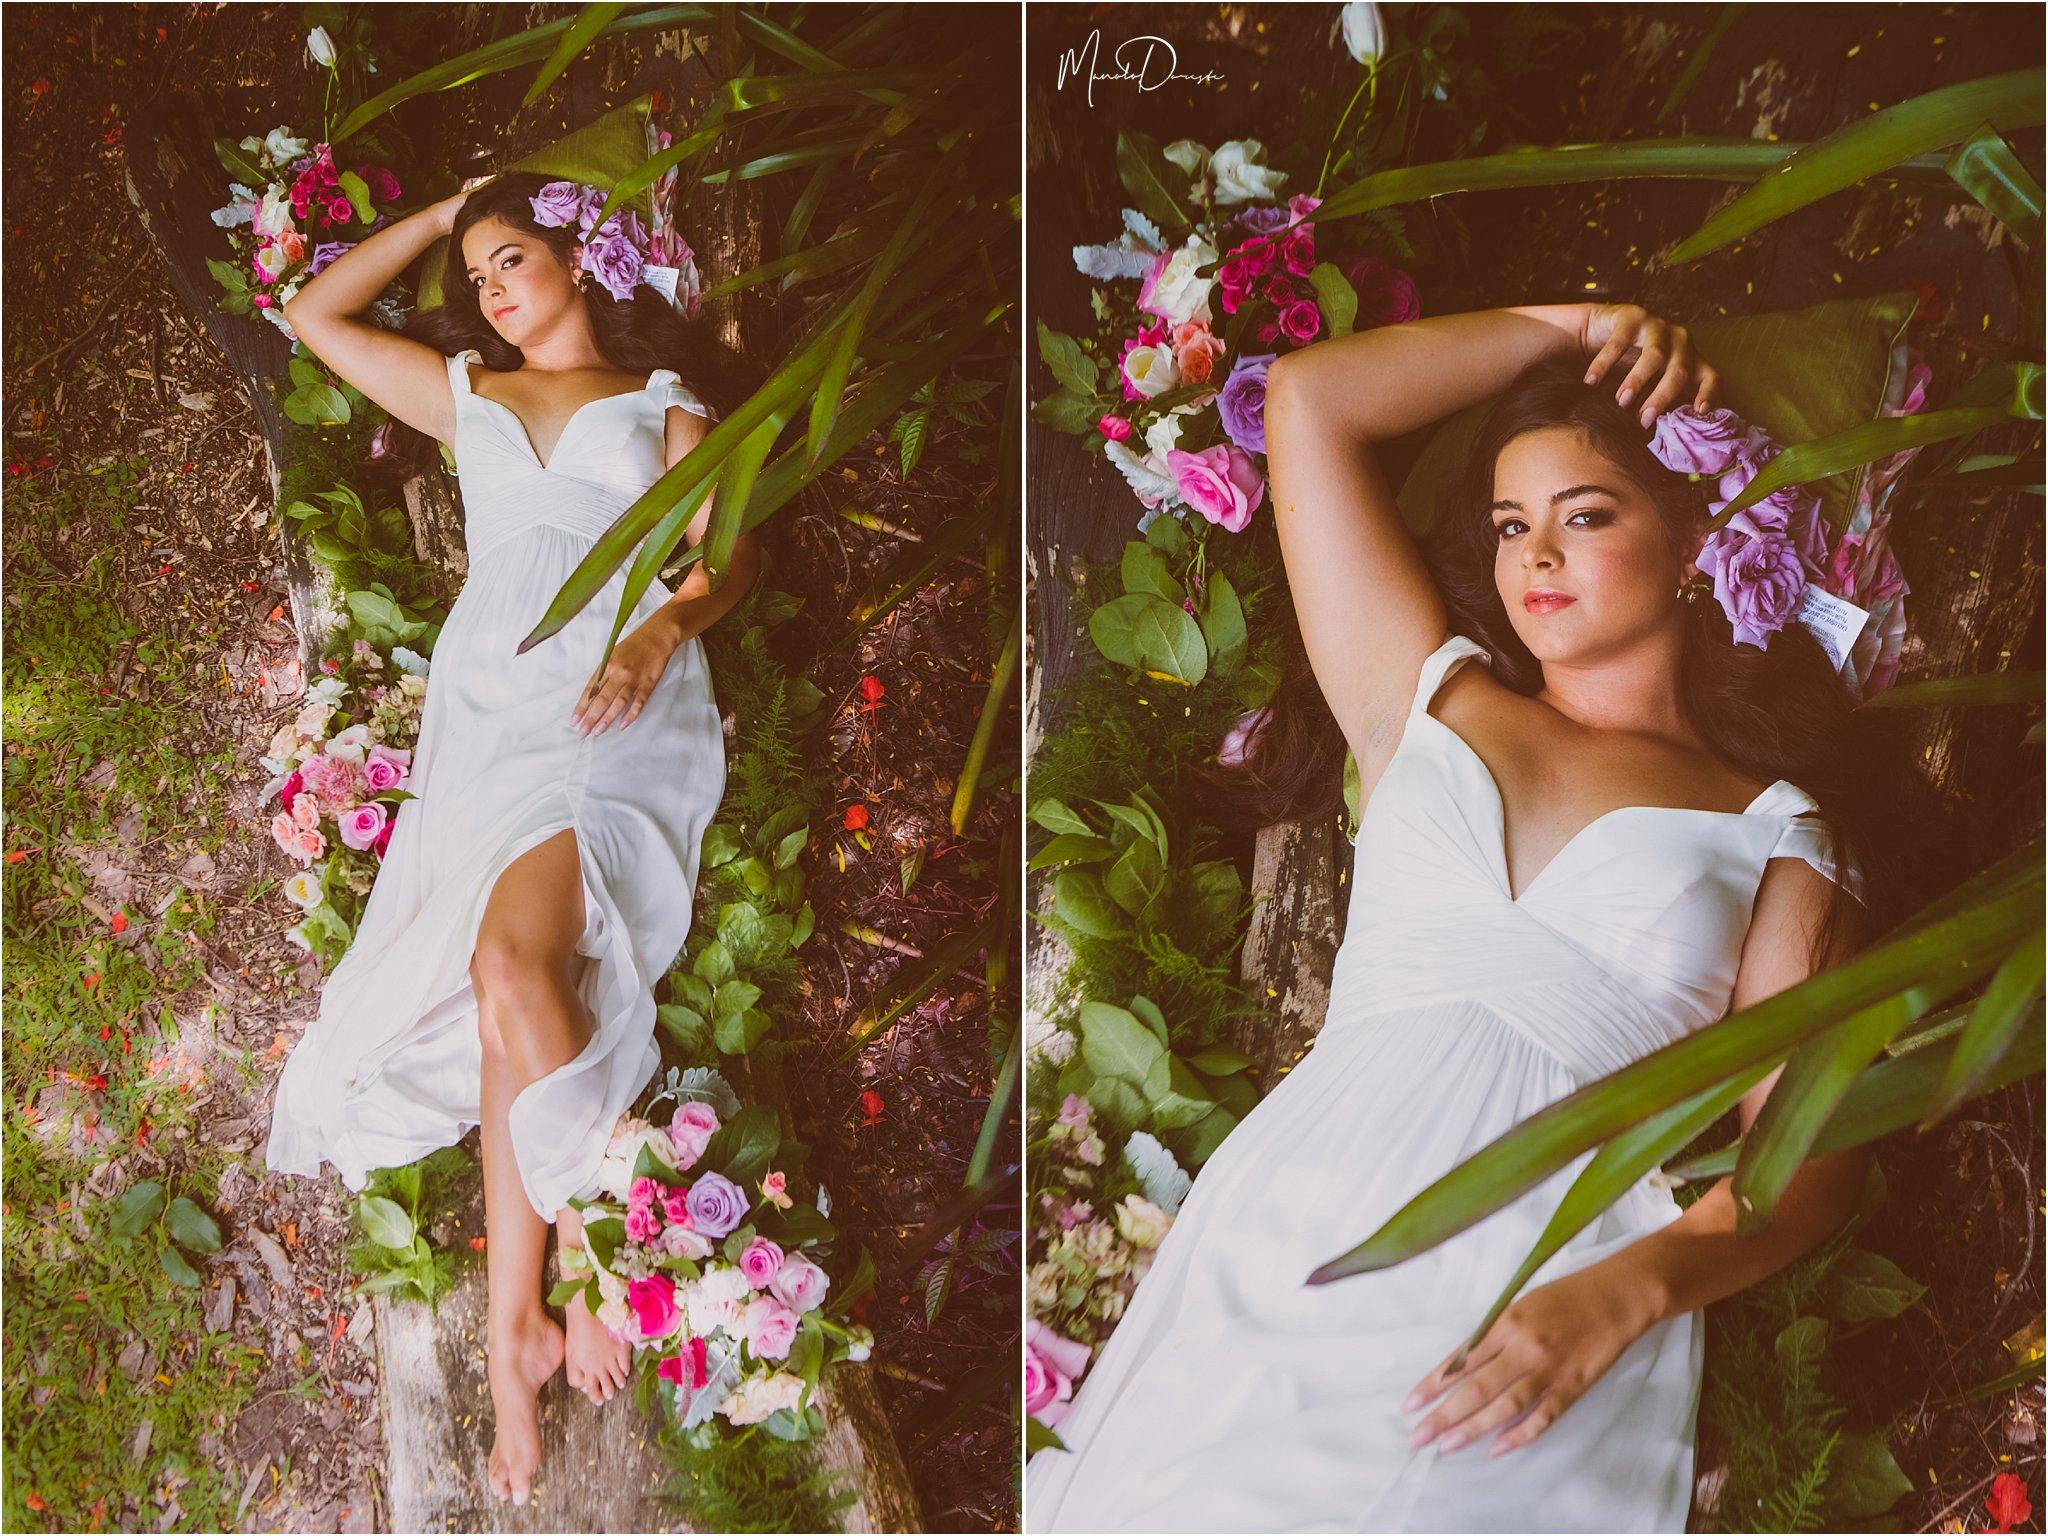 0342_ManoloDoreste_InFocusStudios_Wedding_Family_Photography_Miami_MiamiPhotographer.jpg